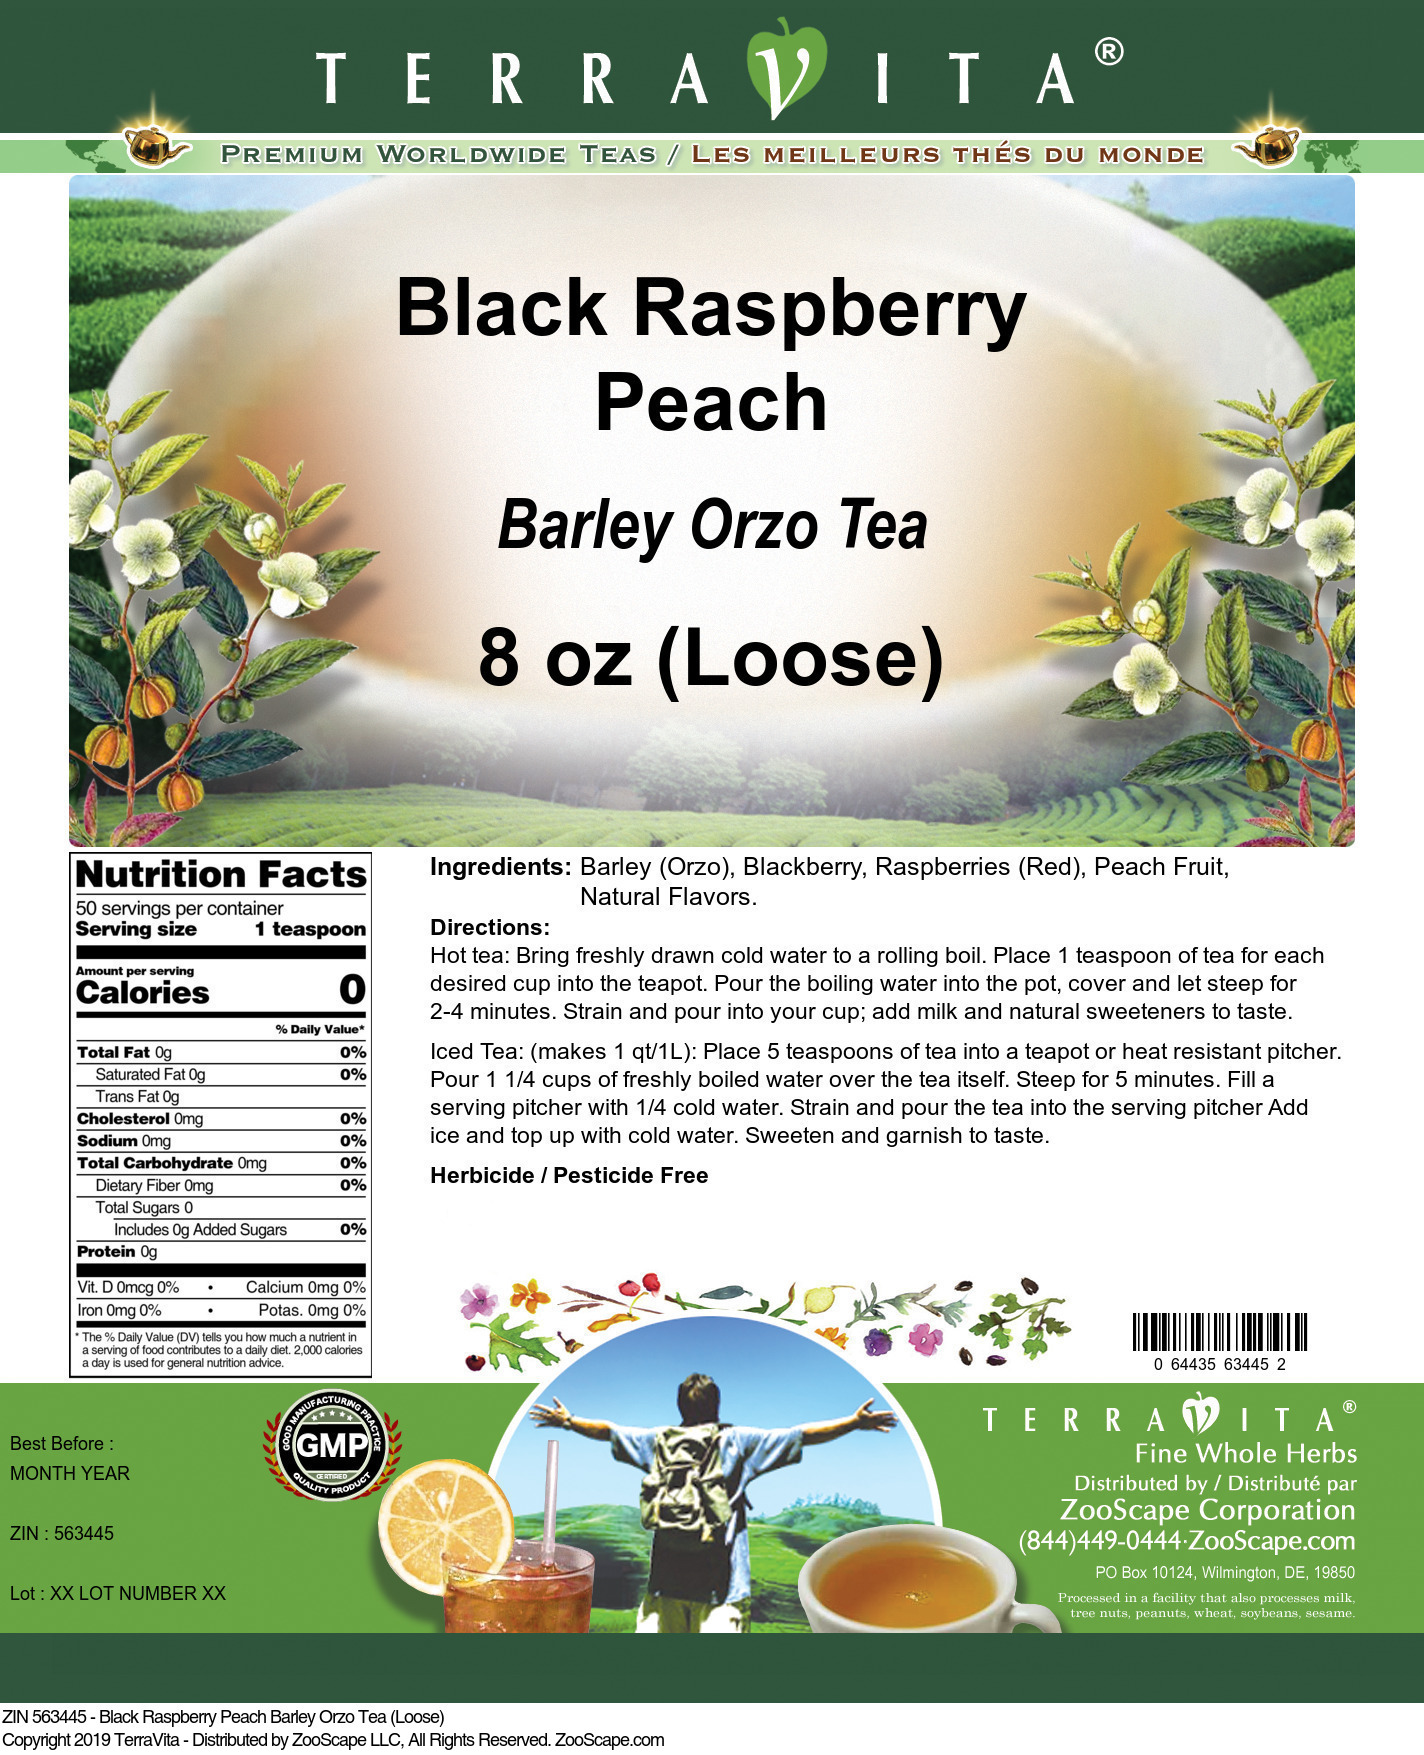 Black Raspberry Peach Barley Orzo Tea (Loose)